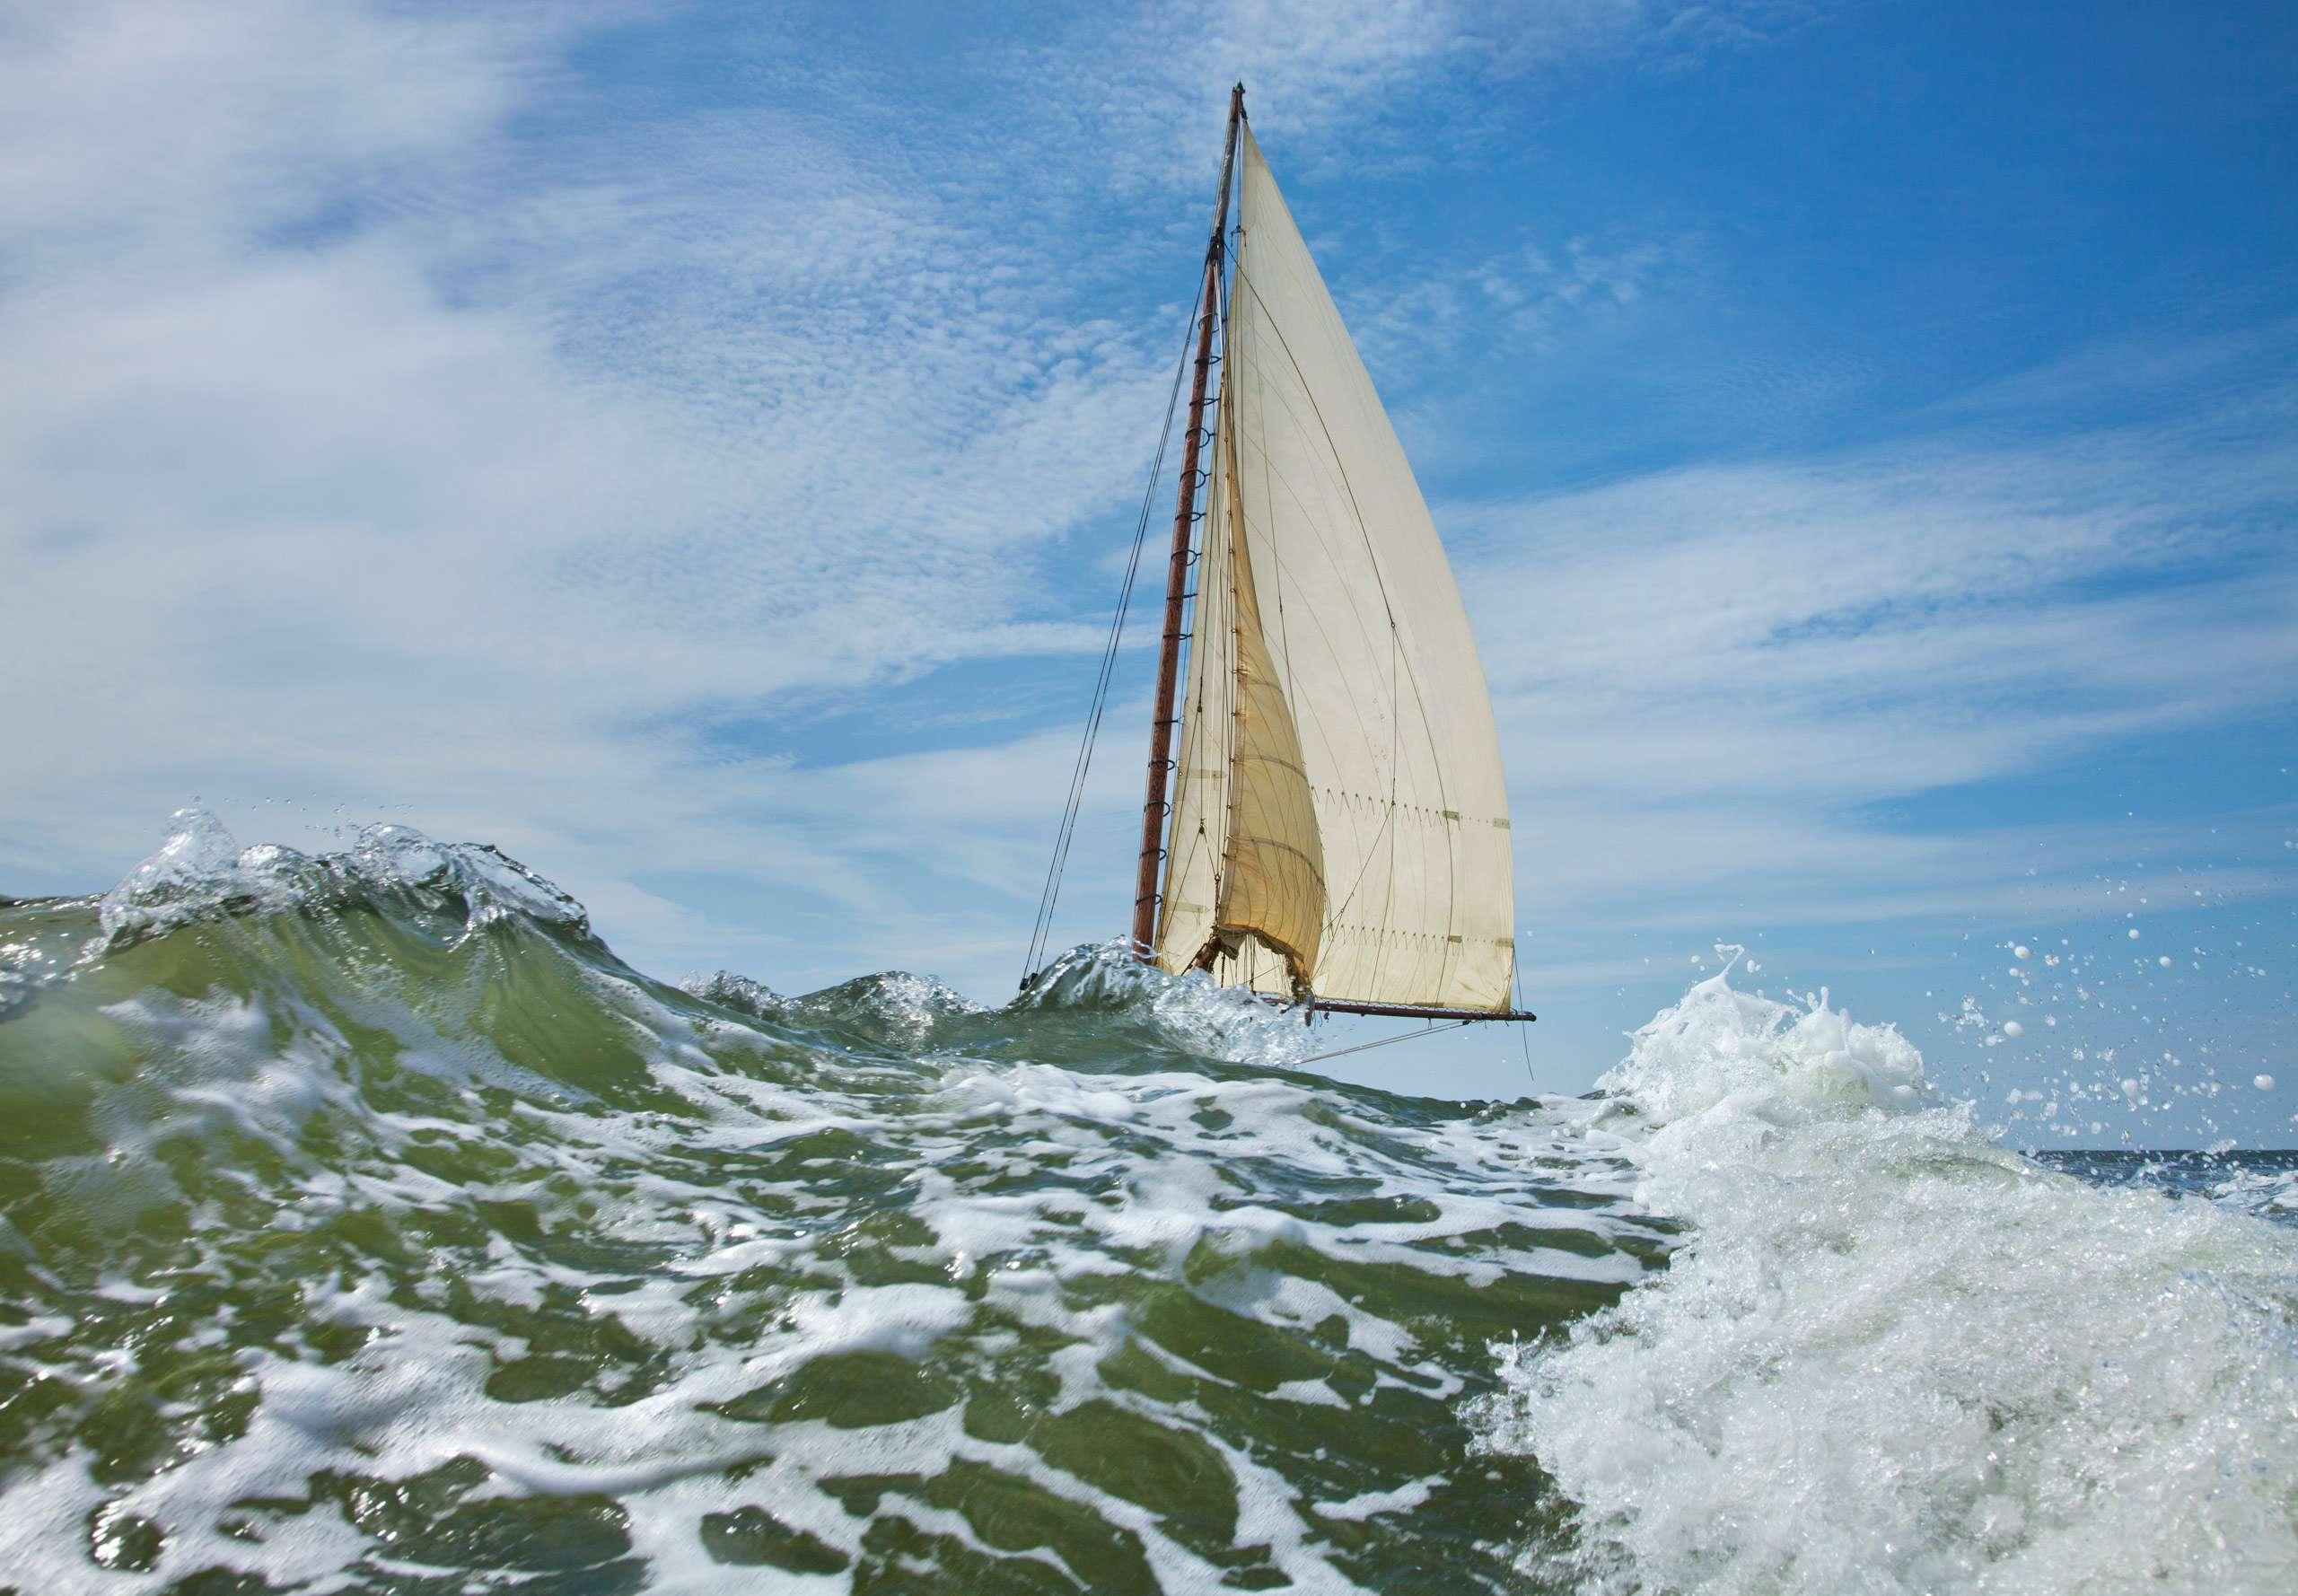 PORTFOLIO - Sailing - Skipjacks #1  PCG656